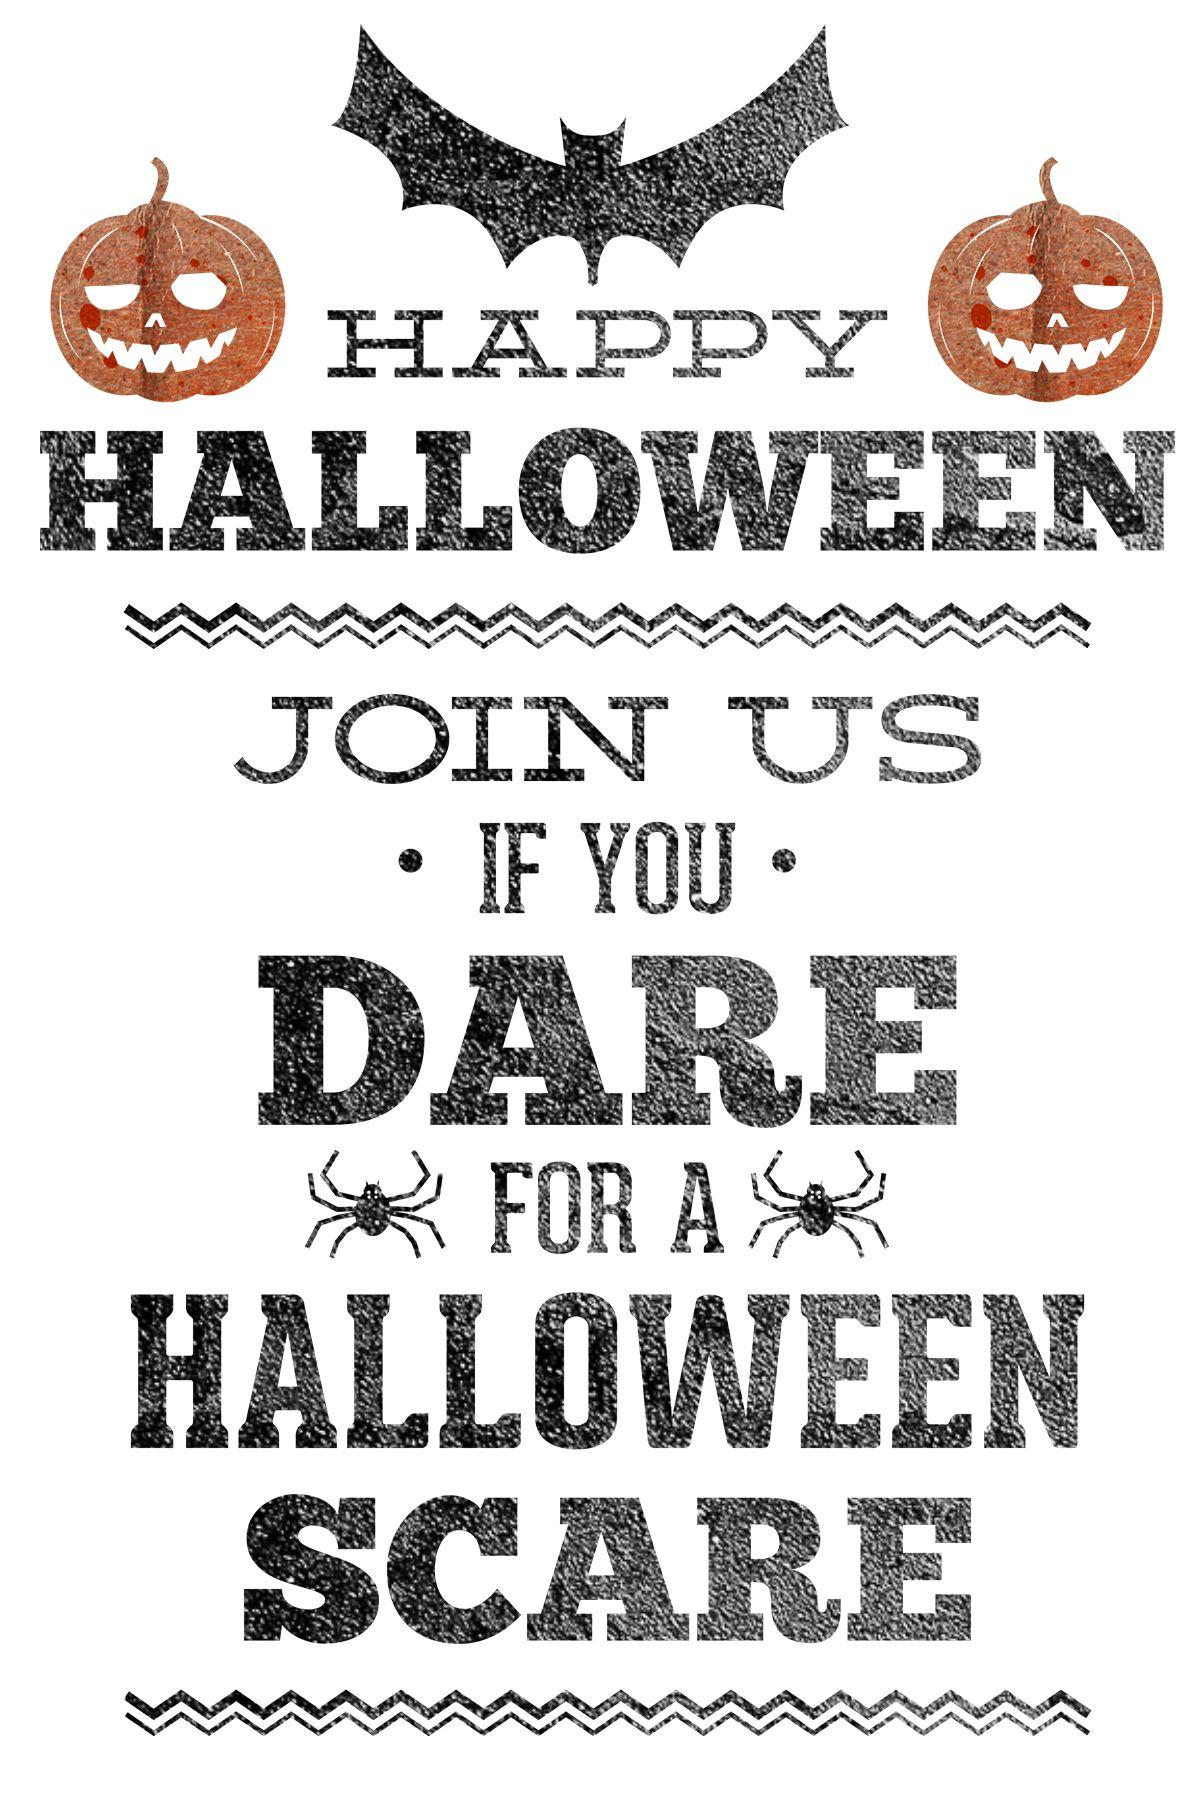 Free Printable Halloween Party Invitation | Halloween Printables 2 - Free Printable Halloween Party Invitations